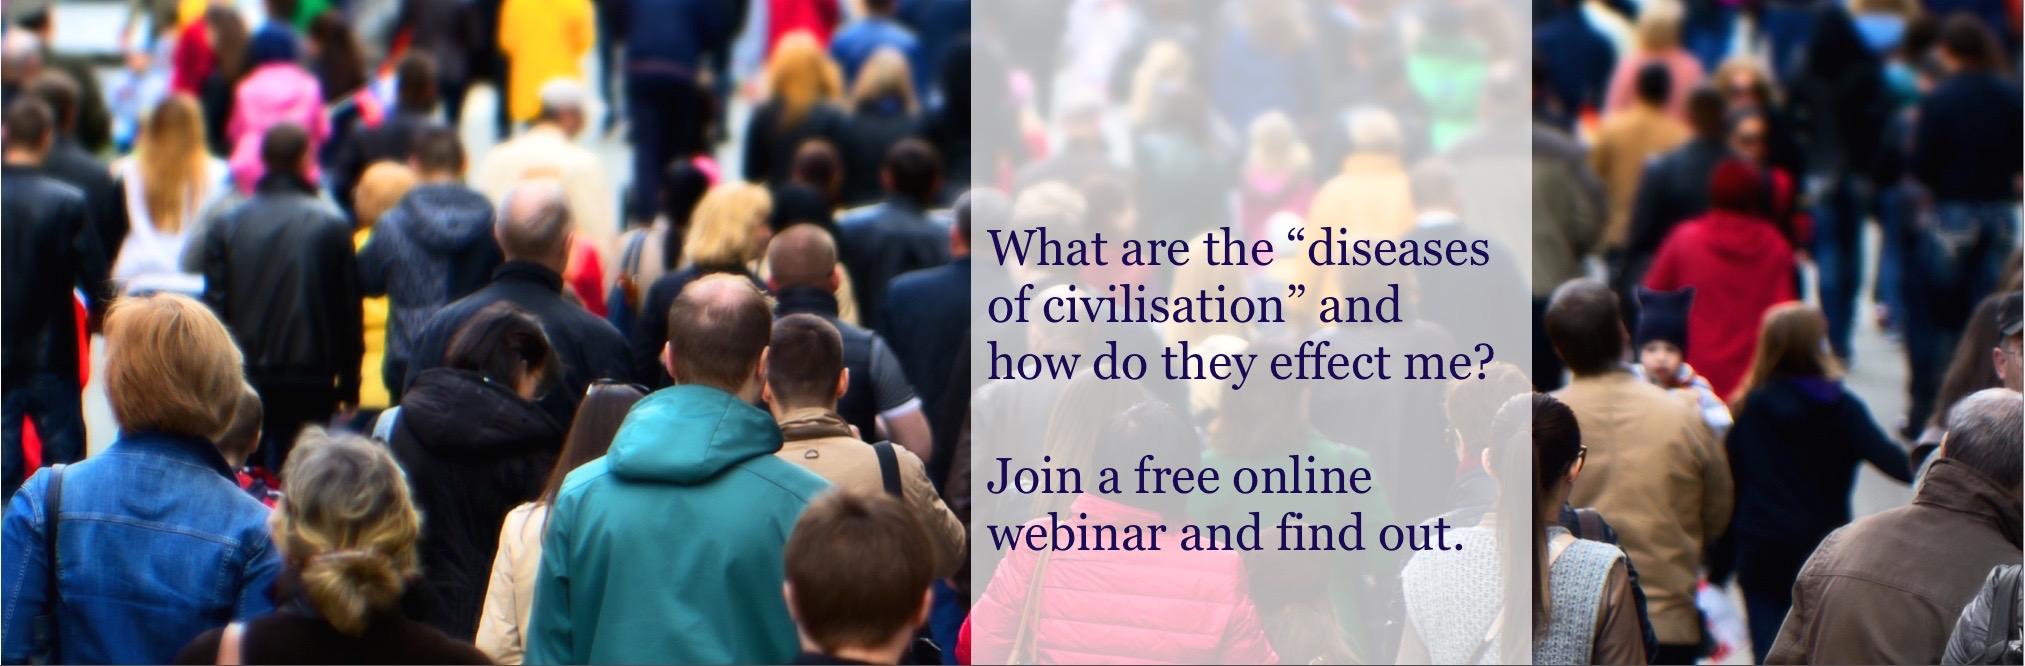 whatcivilization